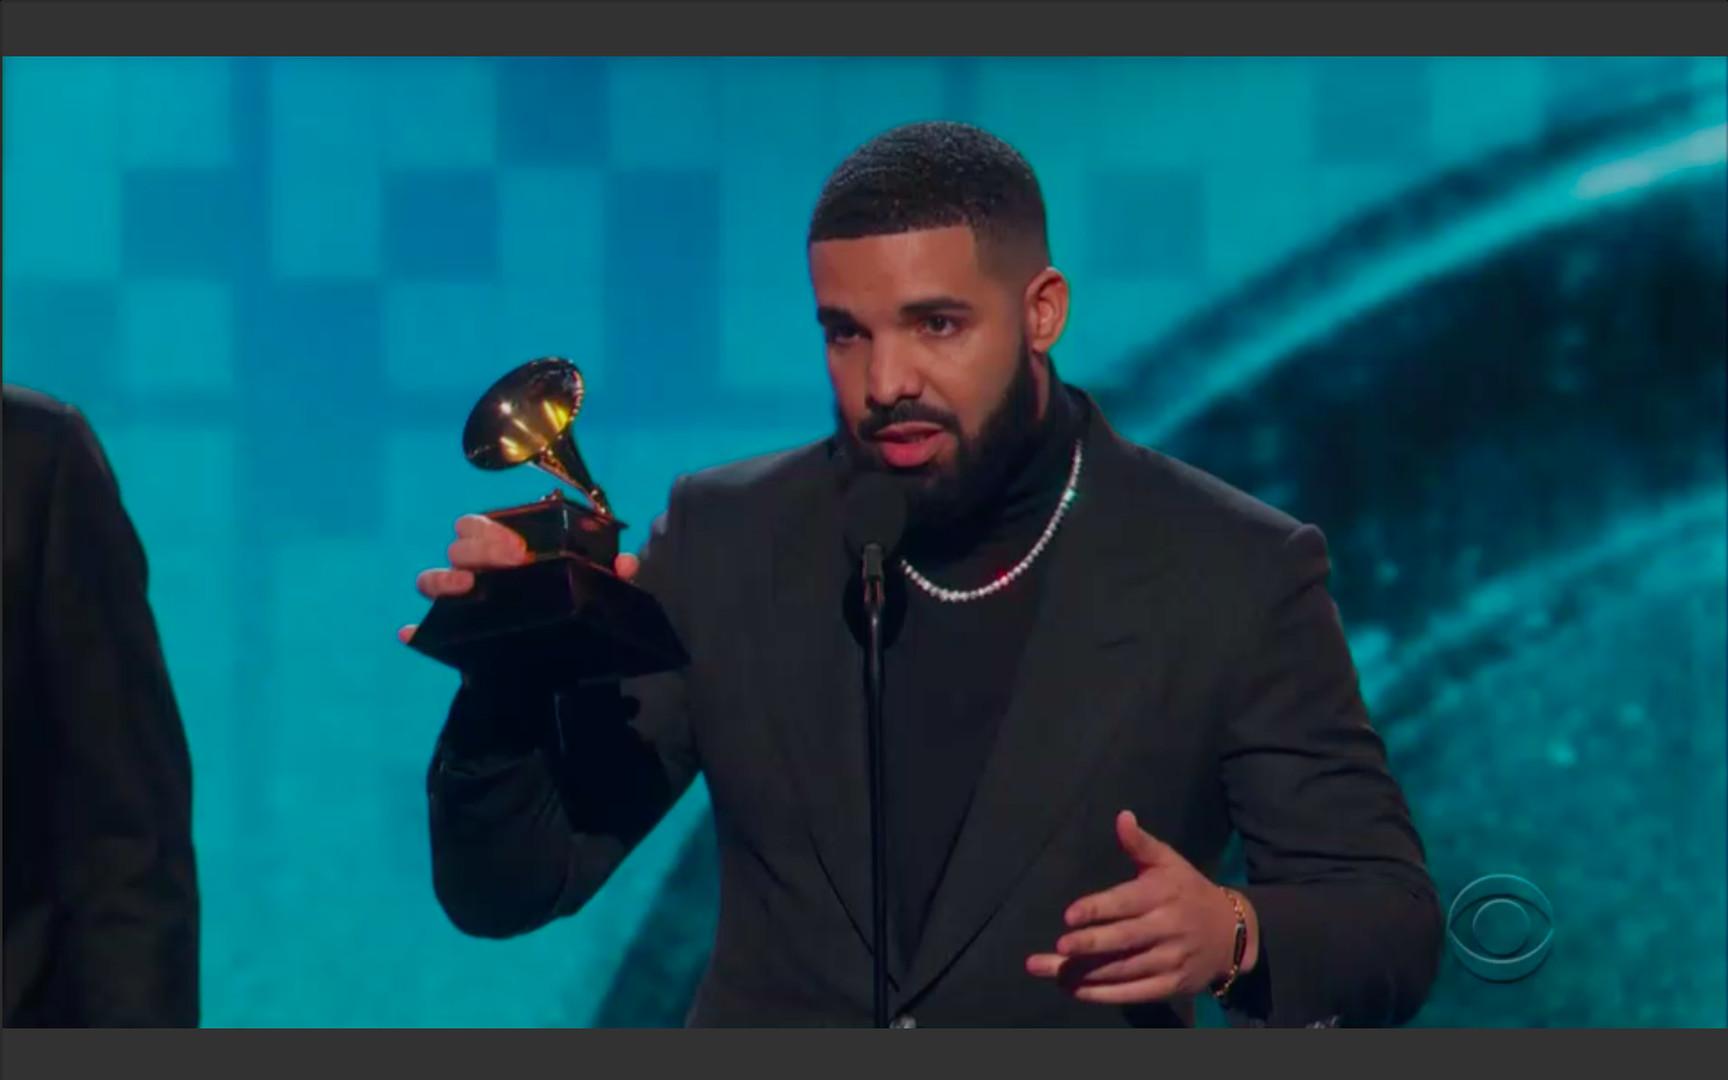 The Grammys cut off Drake's acceptance speech - Vox